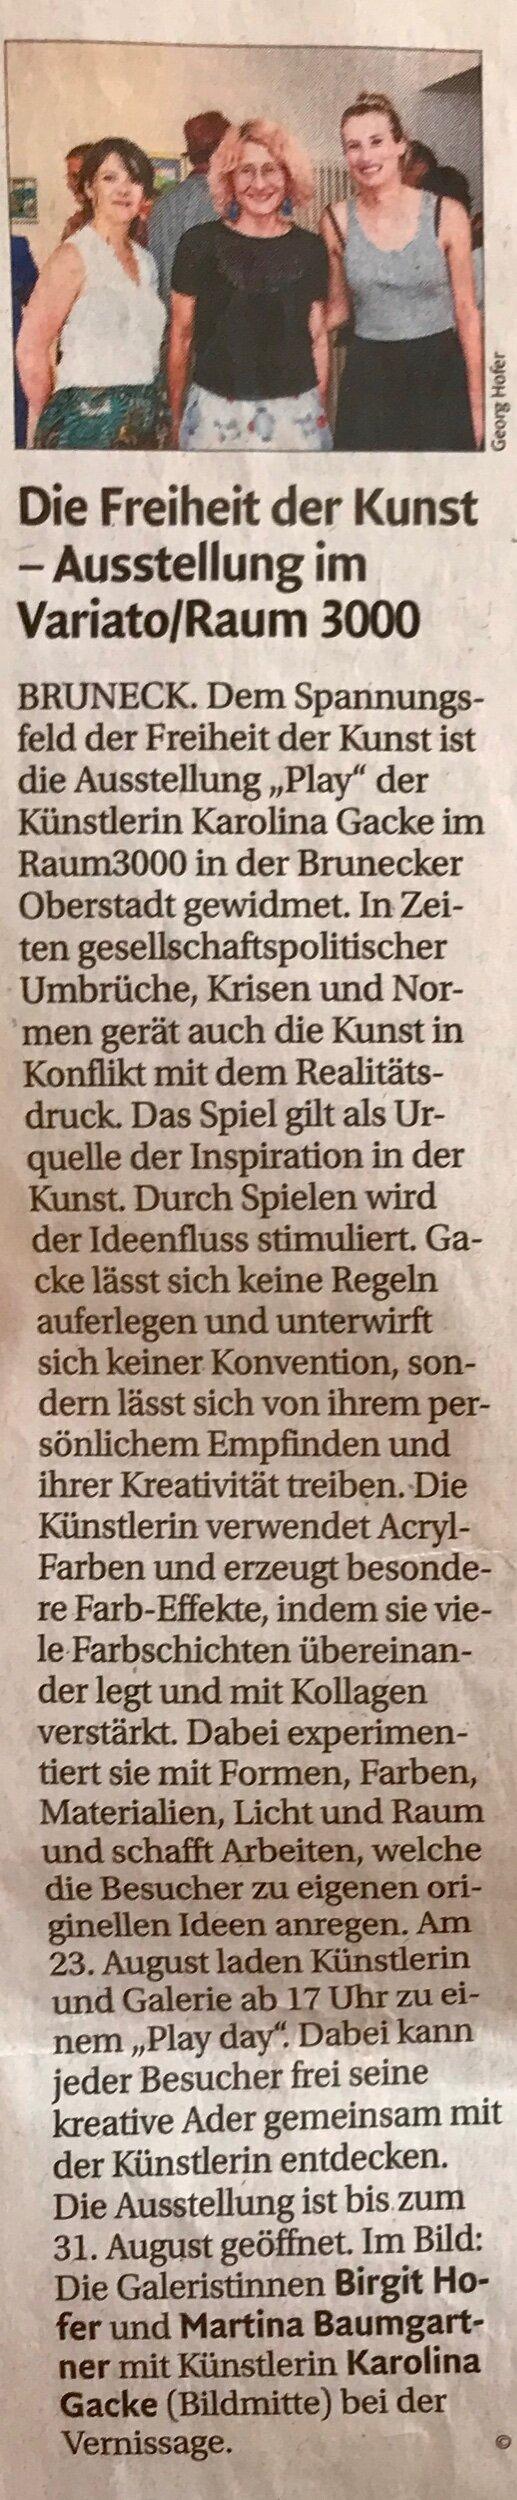 Play-review-Dolomiten.jpeg